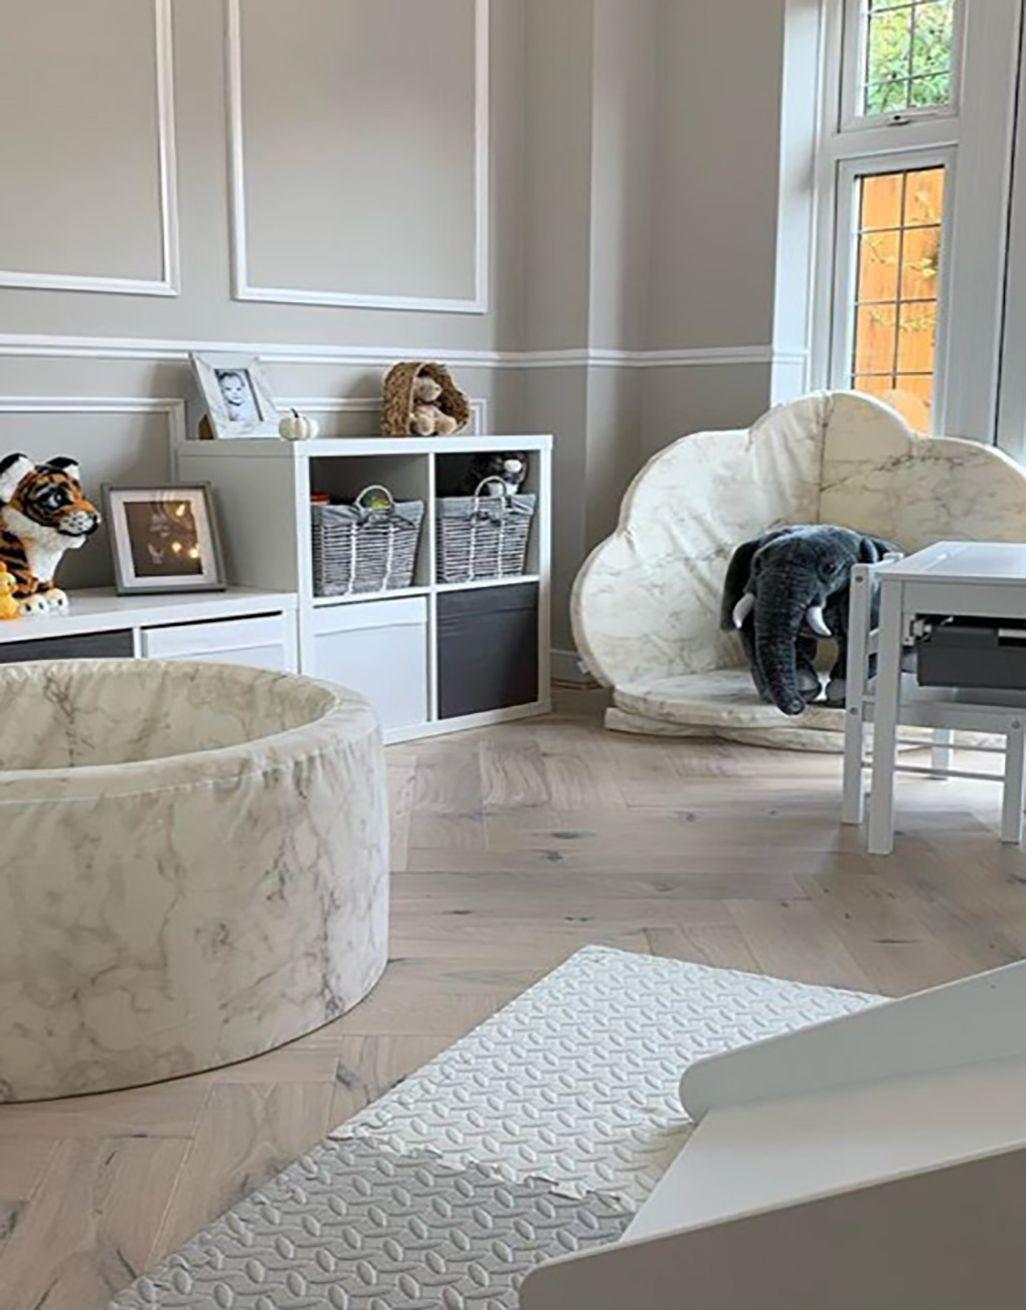 Marylebone Chantilly Lace Oak Lacquered Engineered Wood Flooring In 2020 Herringbone Wood Floor Direct Wood Flooring